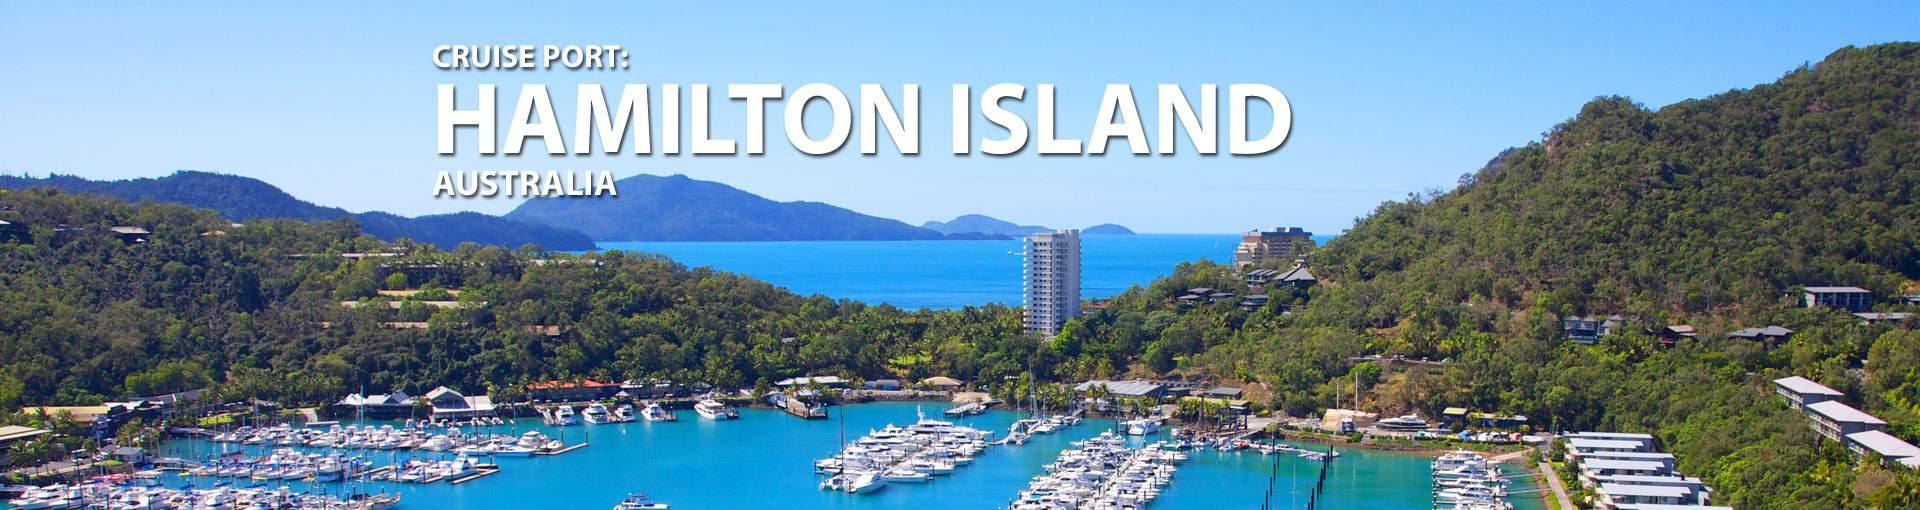 Cruises to Hamilton Island, Australia